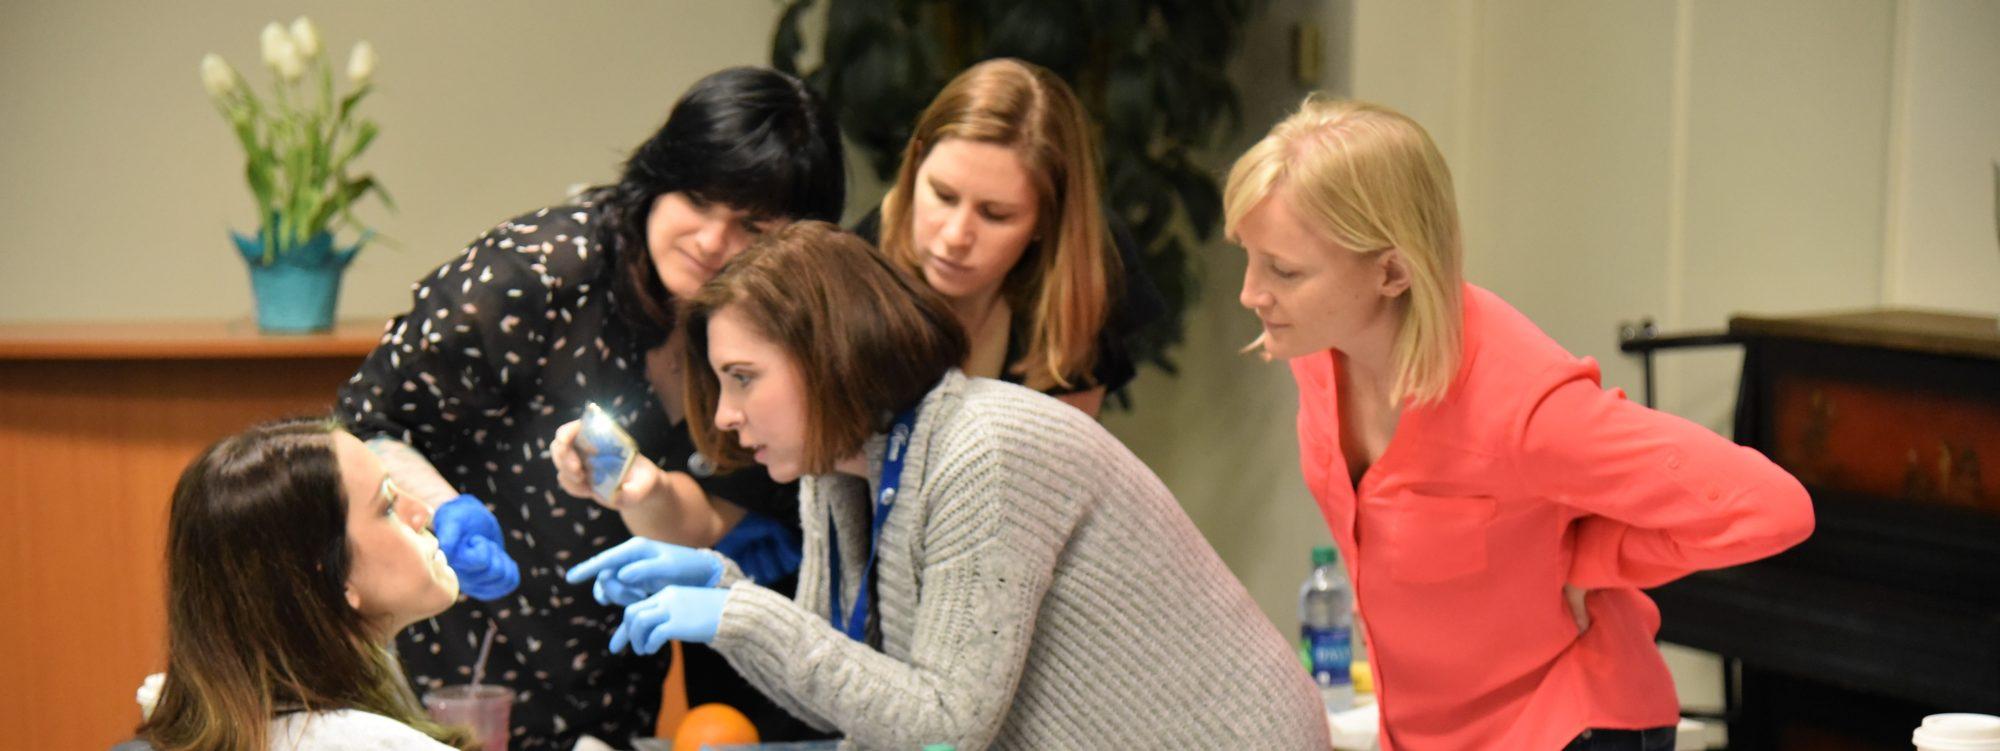 Screening for obstructive sleep apnea dental practice